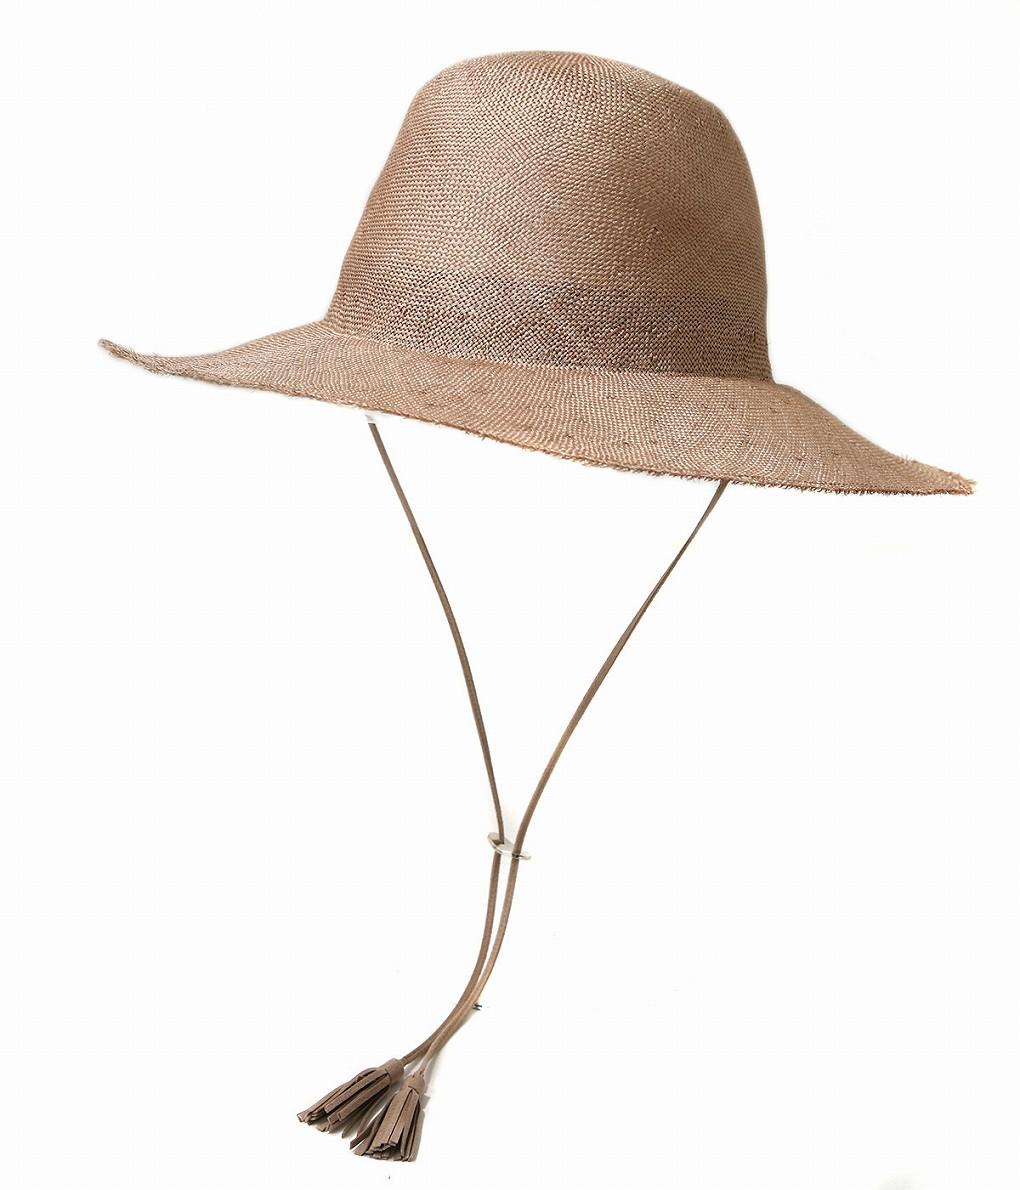 KIJIMA TAKAYUKI / キジマ タカユキ : 【レディース】WIDE BRIM HAT : ワイド ブリム ハット ウーマン レディース 帽子 : W-191253 【ANN】